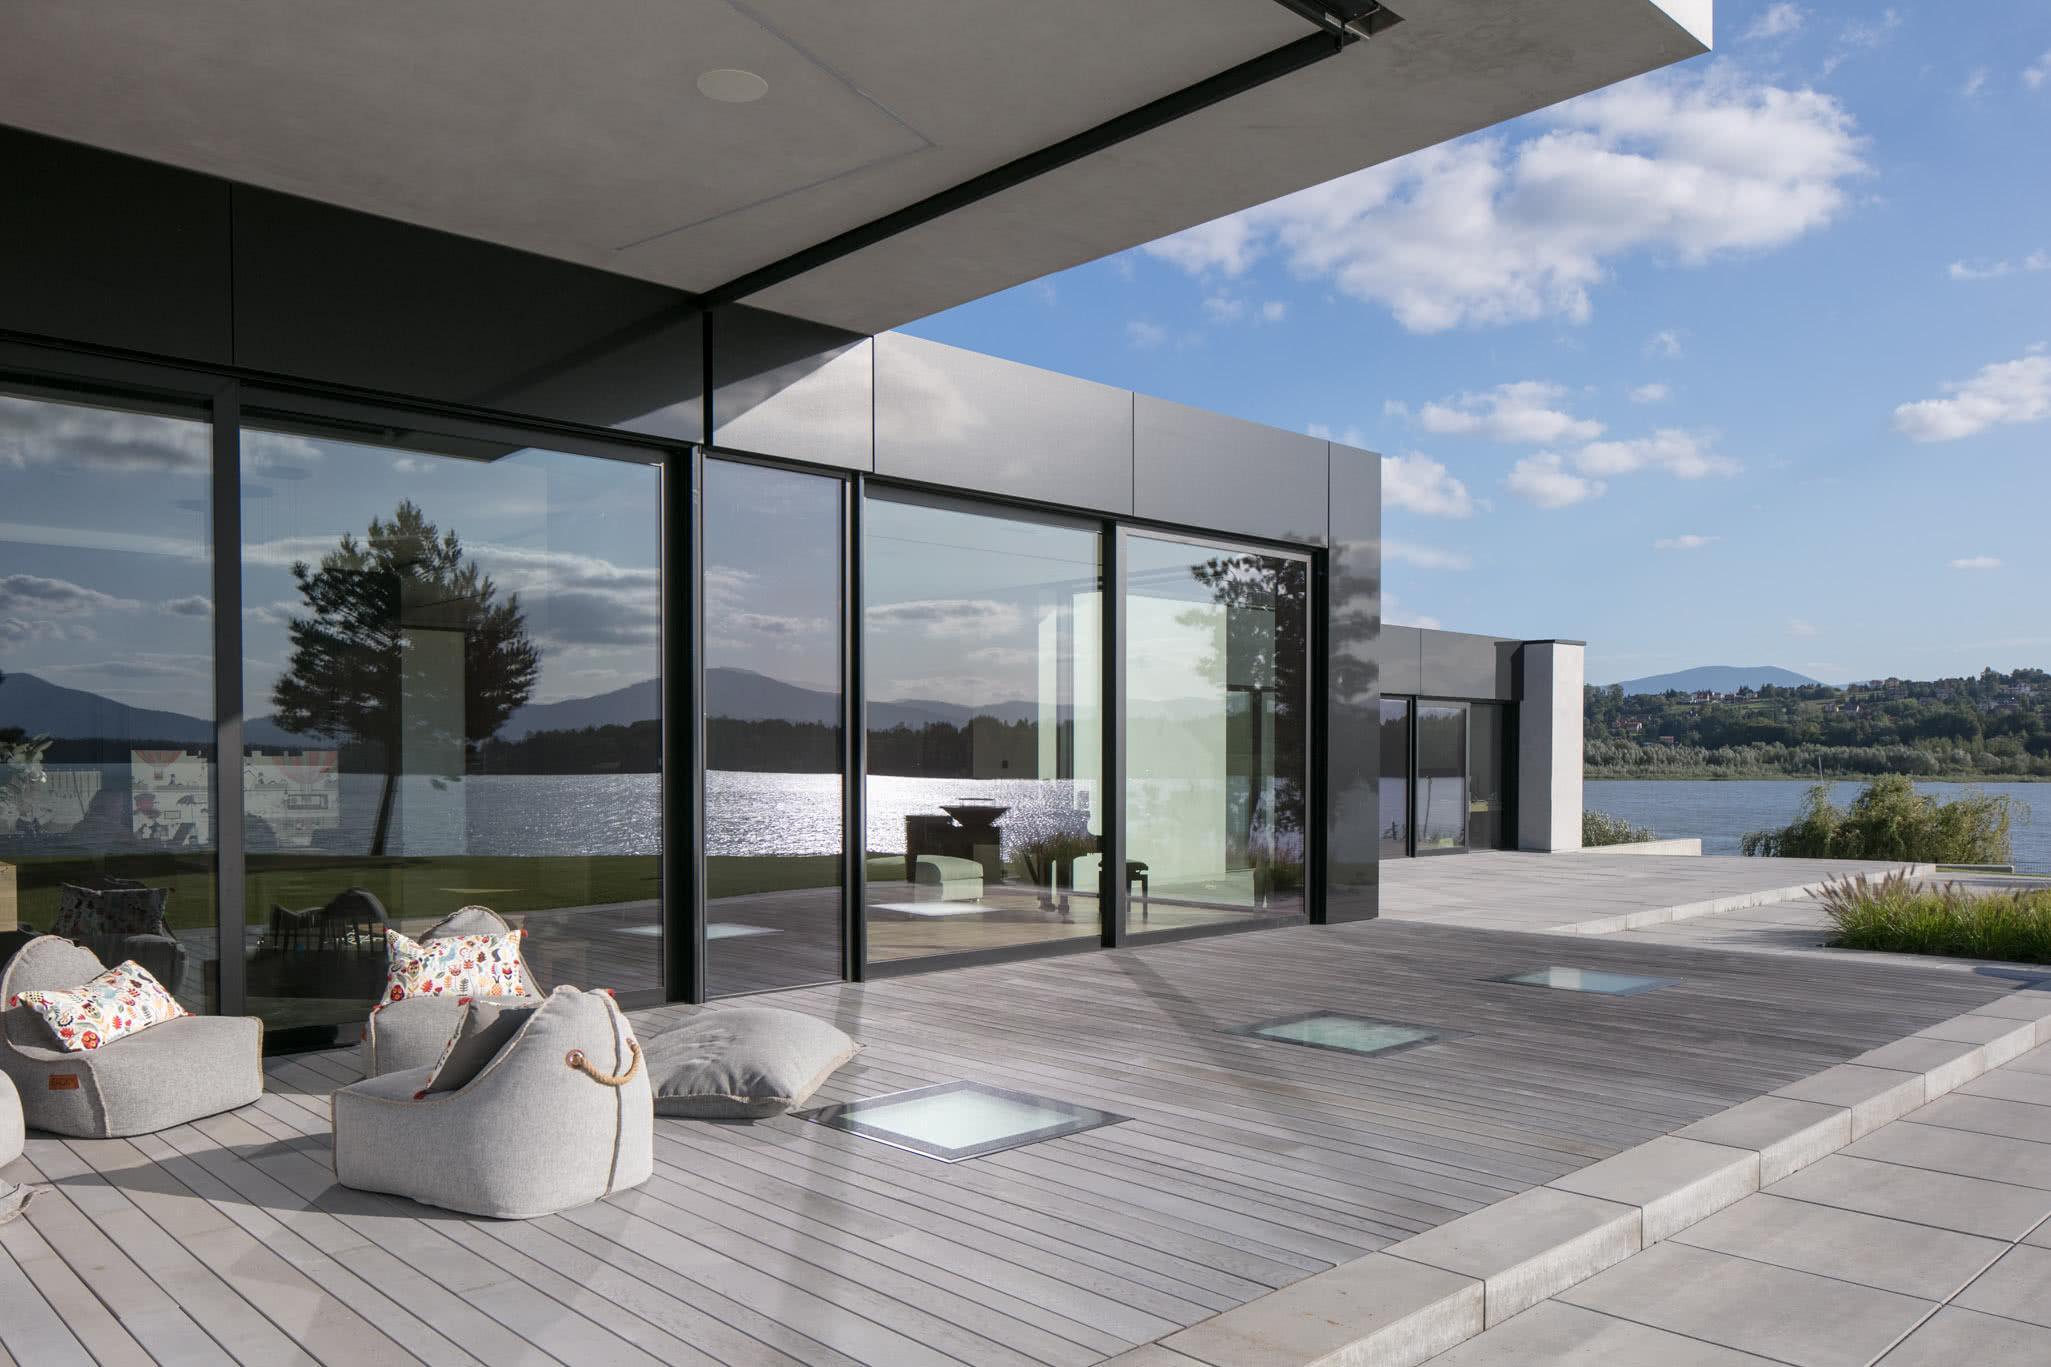 RE: LAKESIDE HOUSE projektu architekta Marcina Tomaszewskiego REFORM Architekt